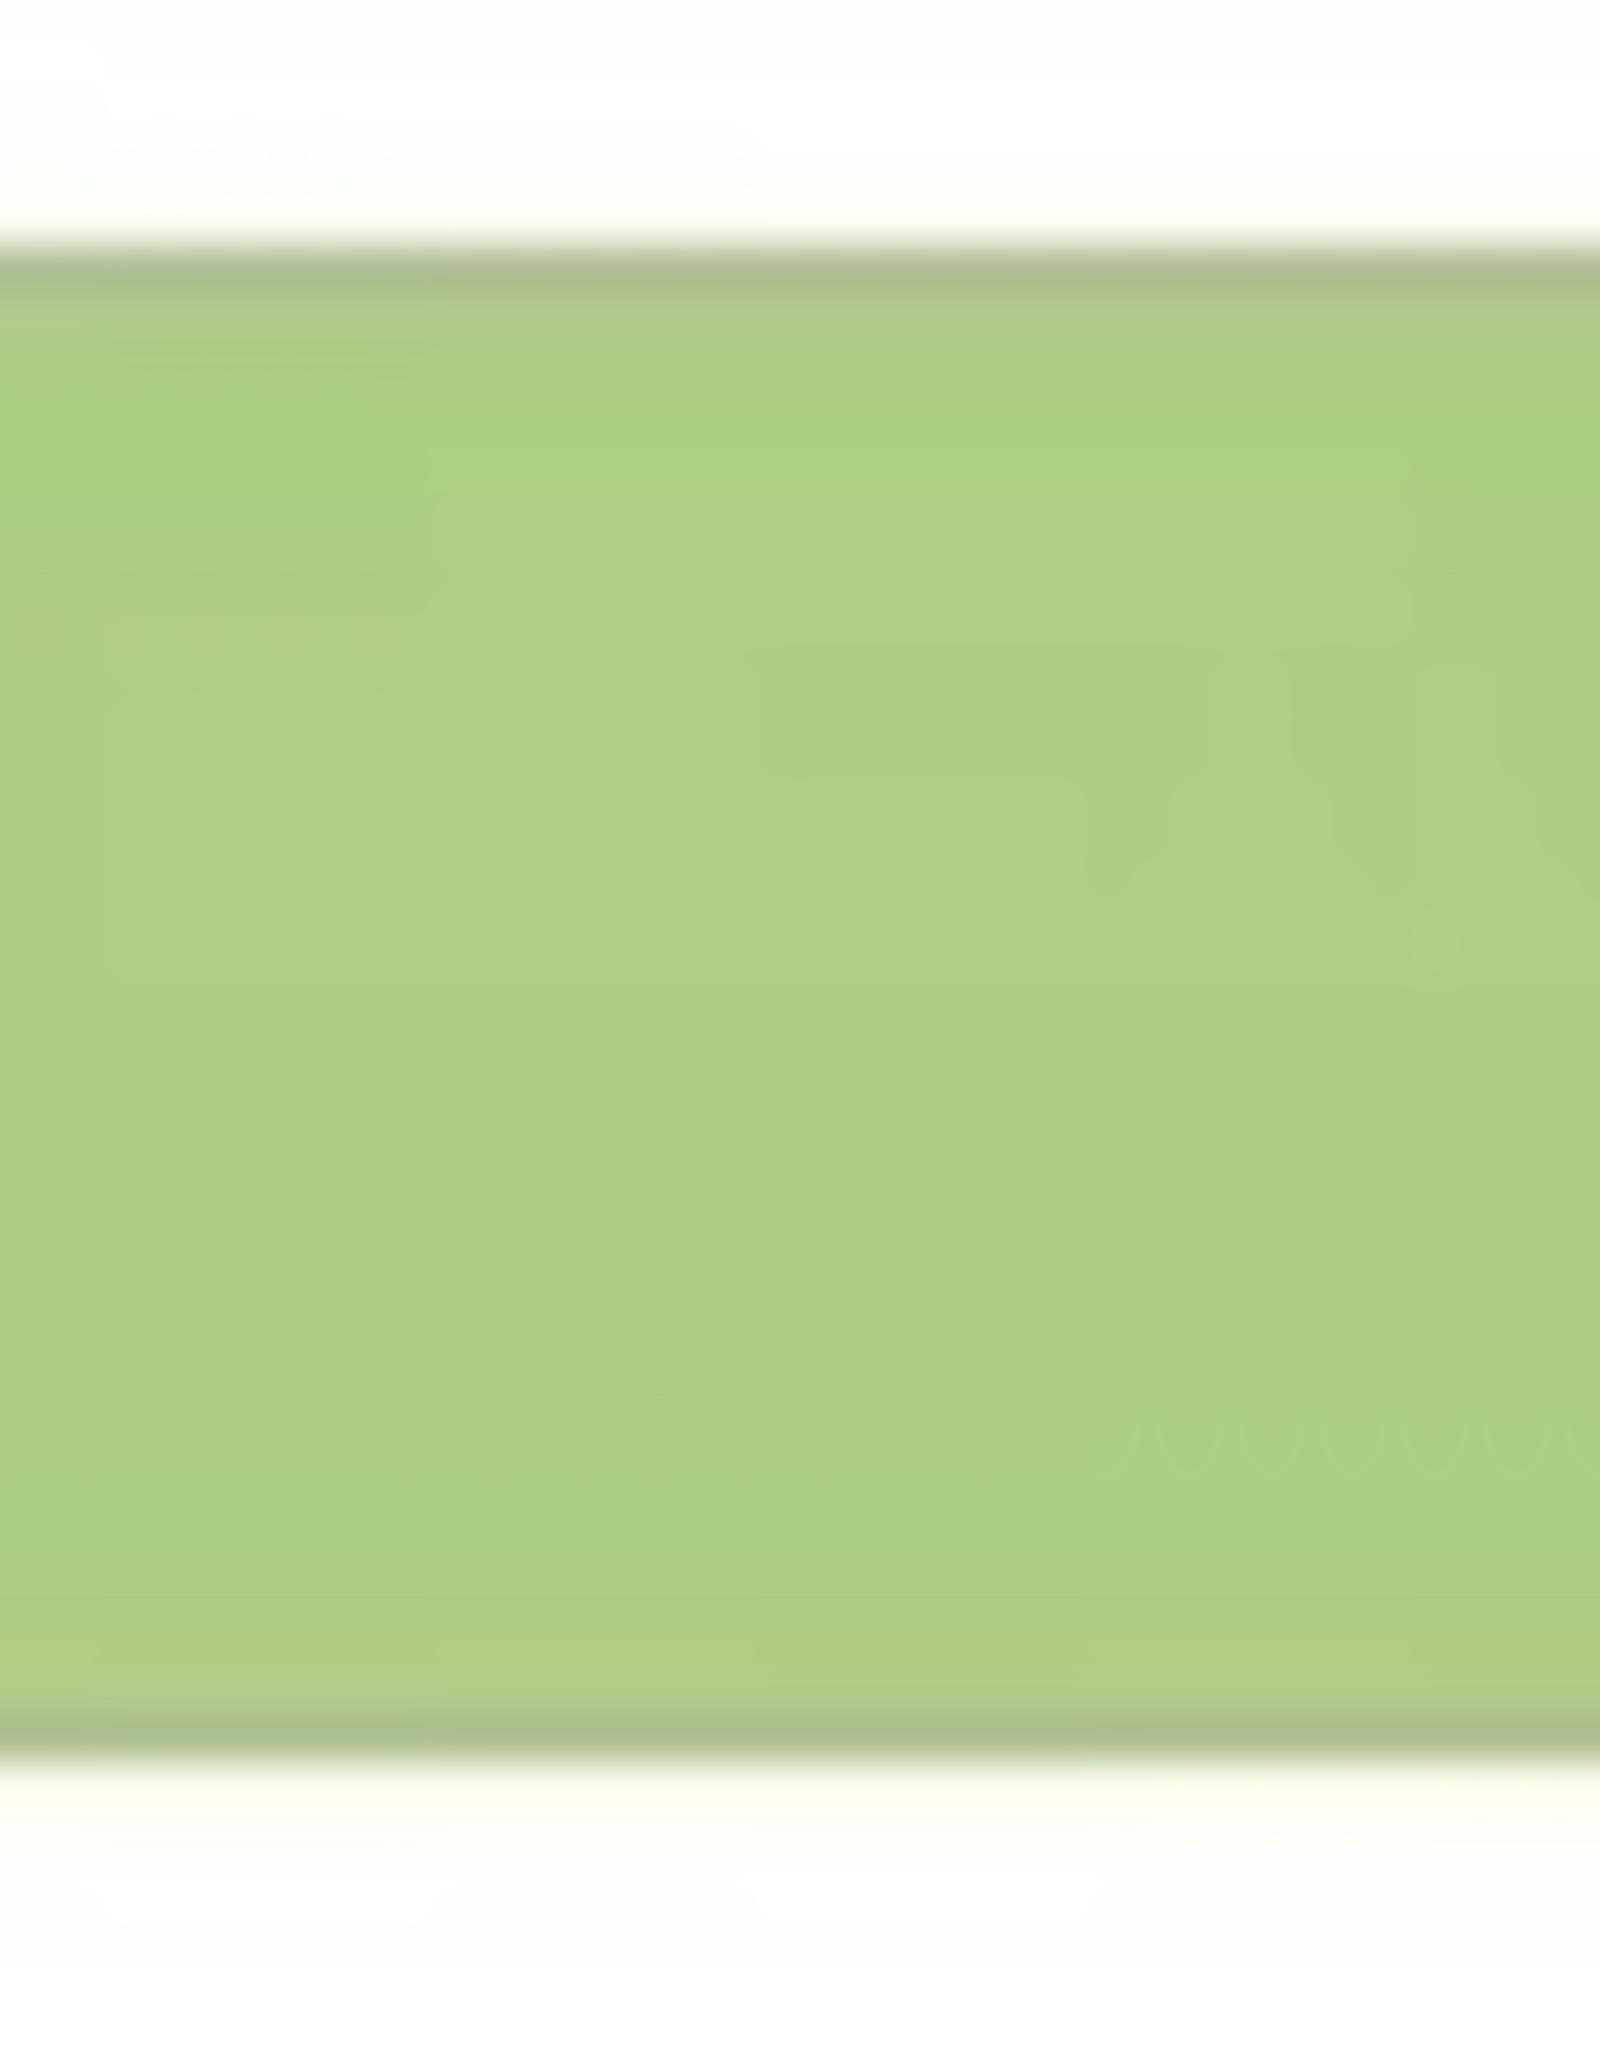 STAHLS Sportsfilm CAD-CUT® kleur Pastekl green 420